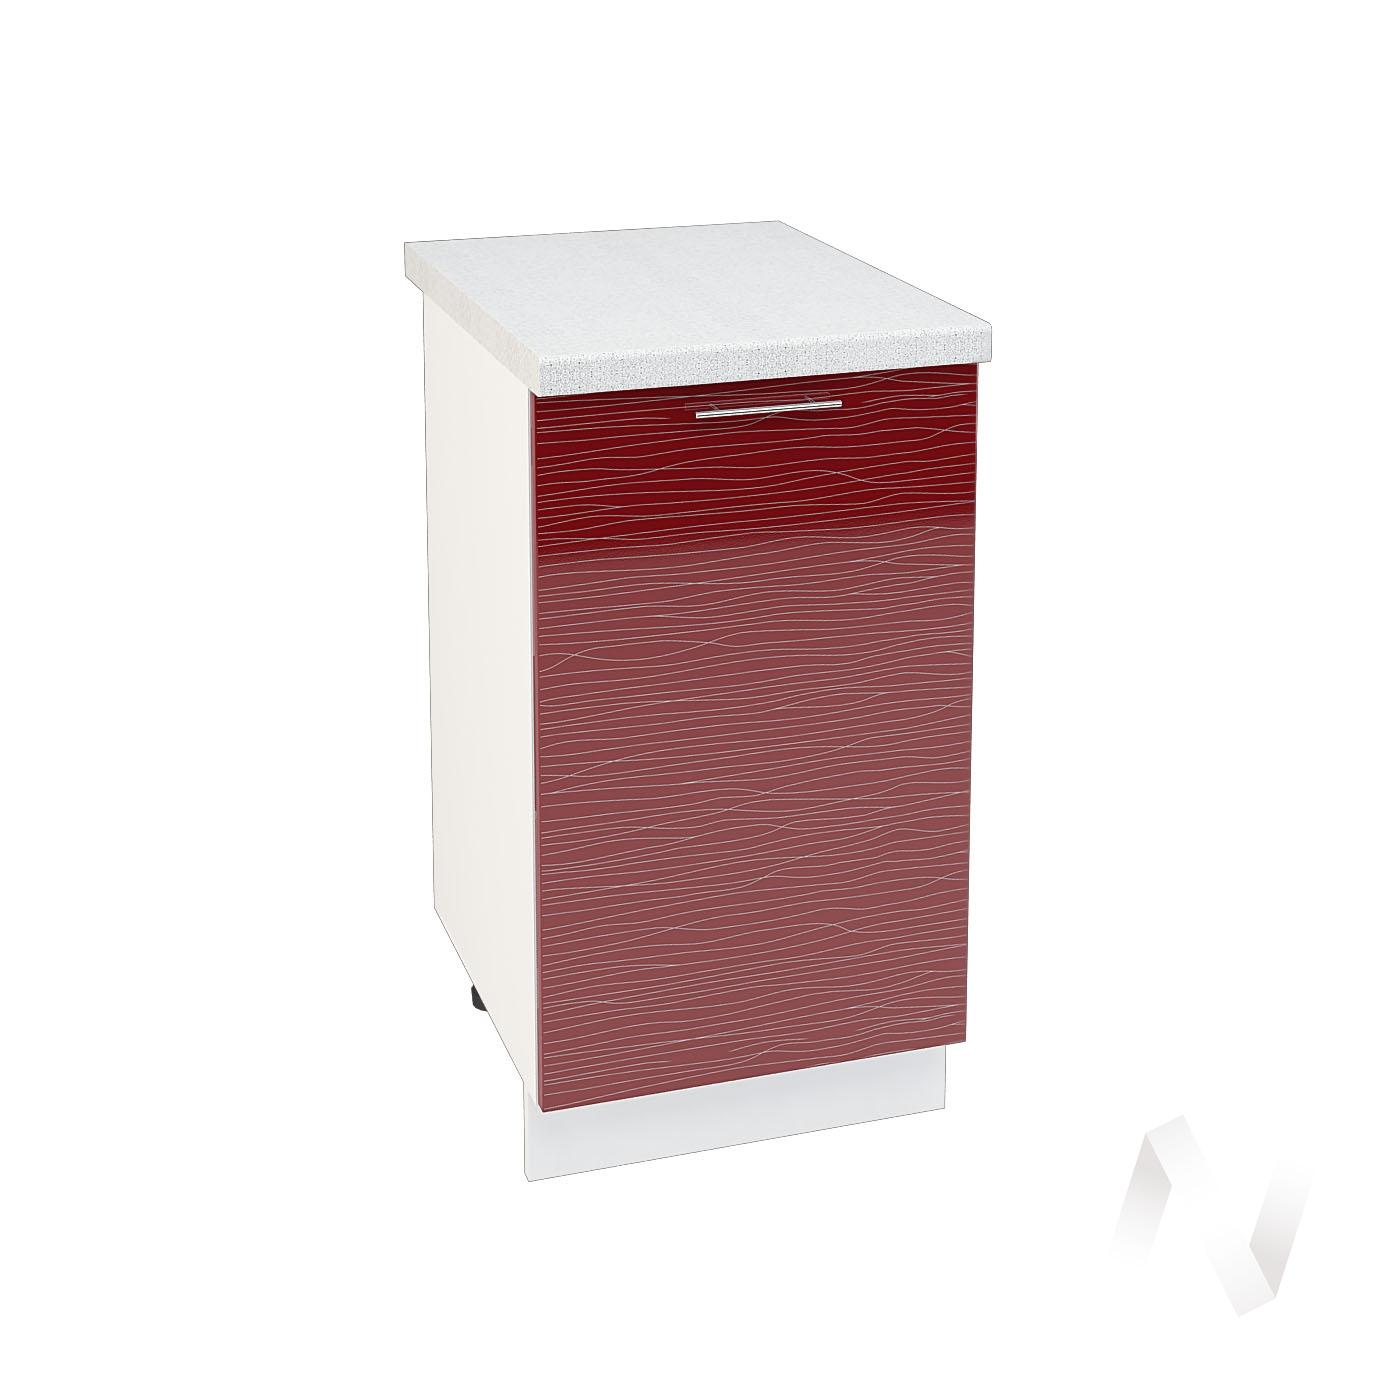 "Кухня ""Валерия-М"": Шкаф нижний 450, ШН 450 (Страйп красный/корпус белый)"